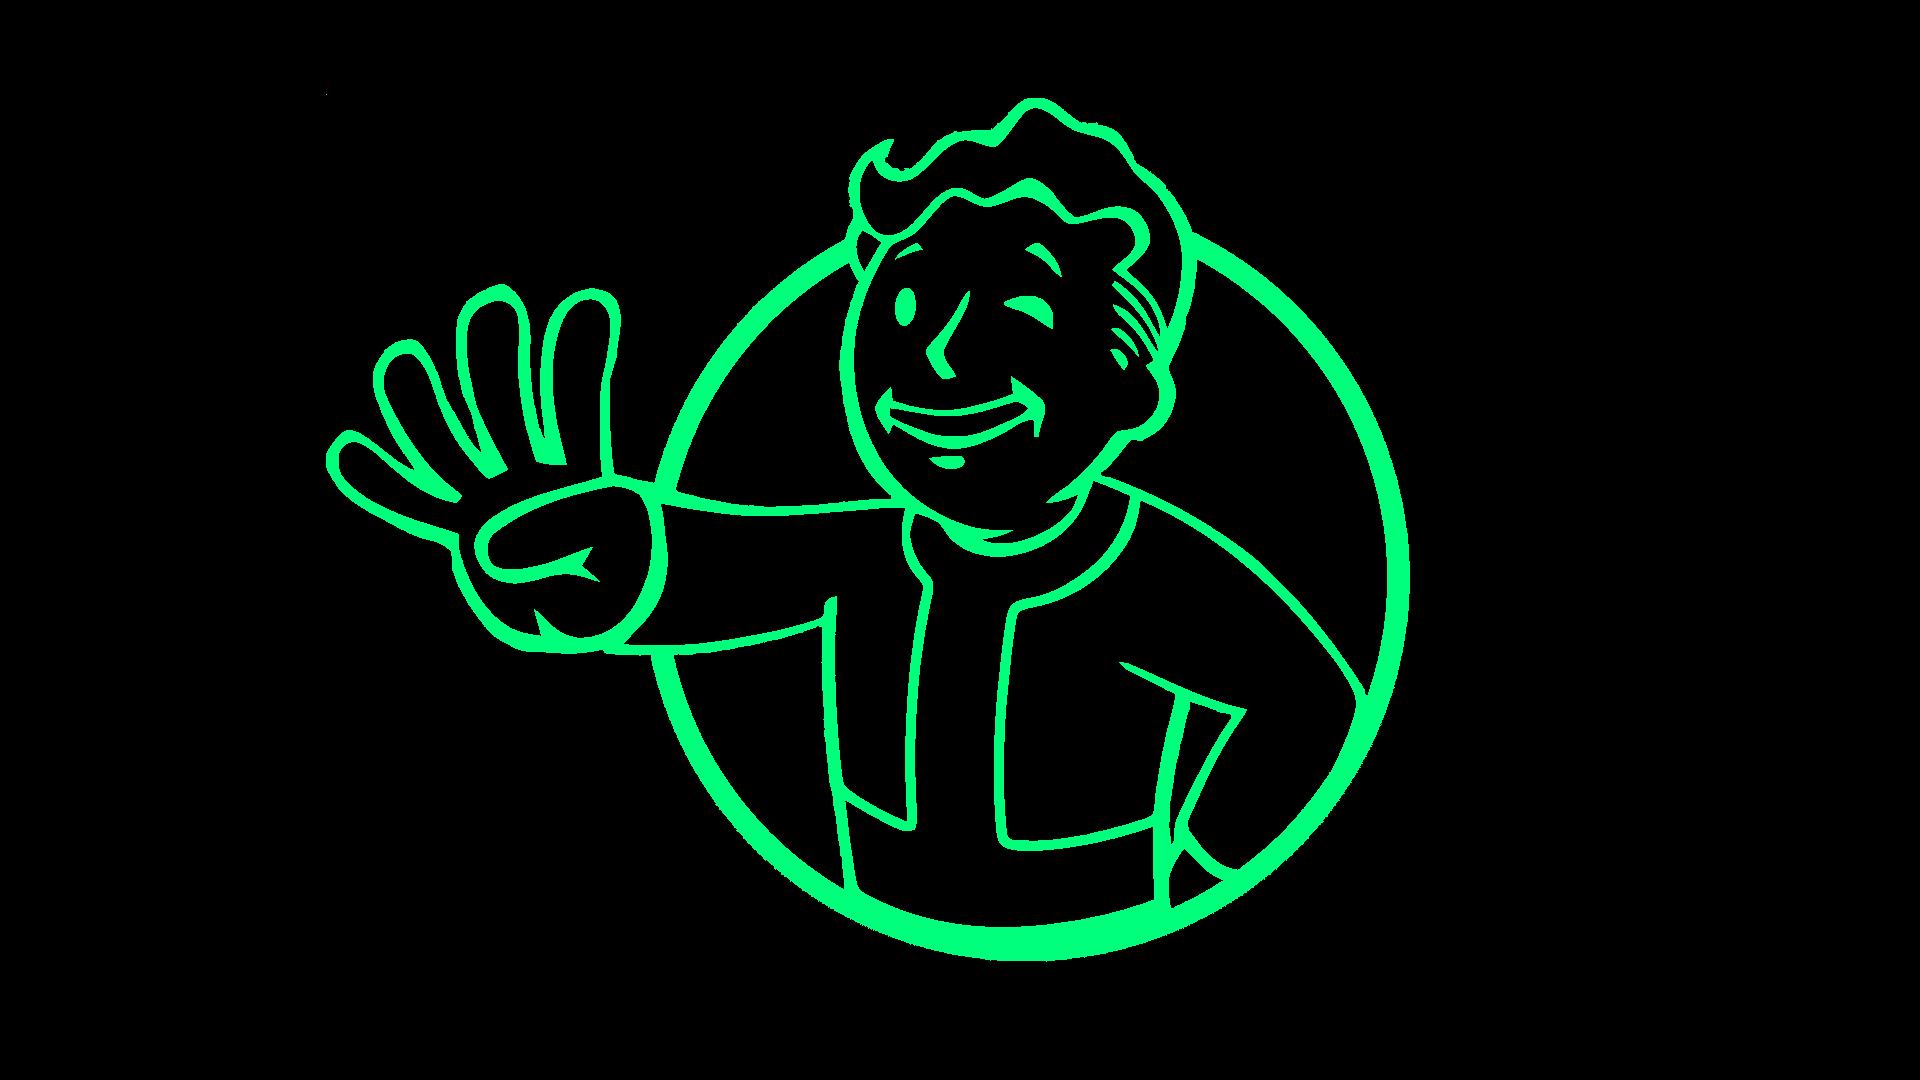 wallpaper : illustration, text, logo, circle, fallout 4, vault boy